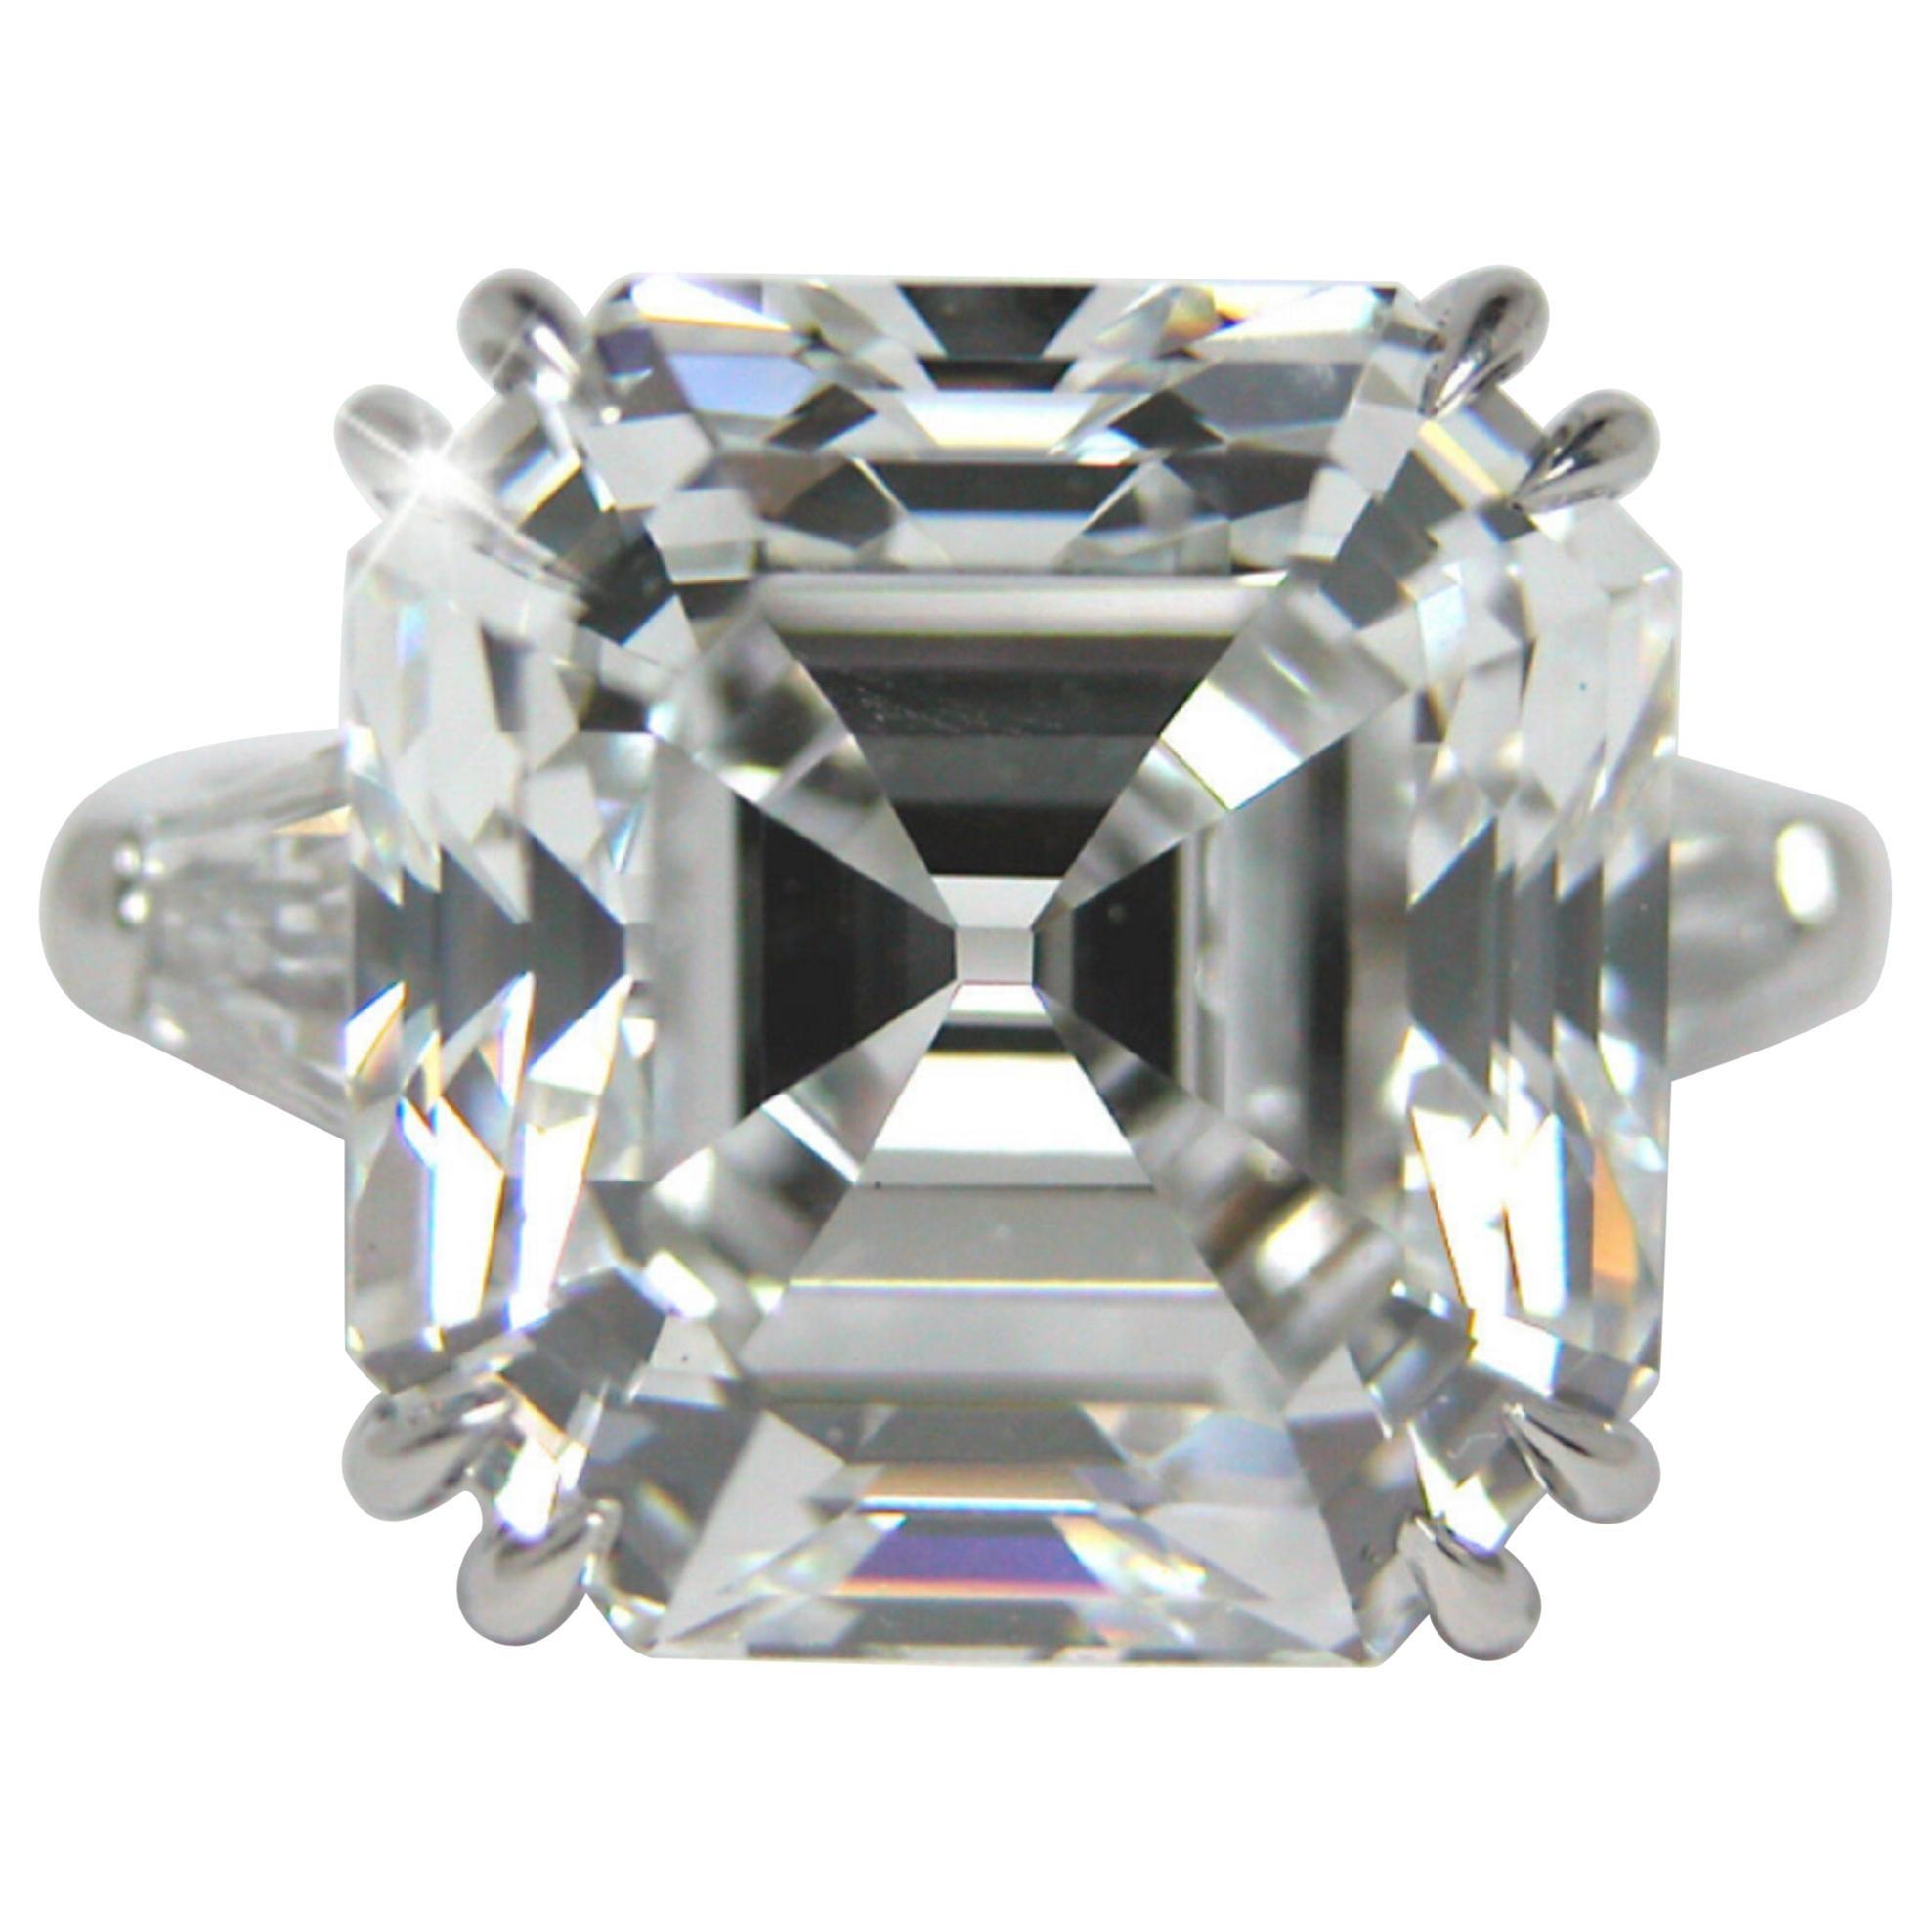 GIA Certified 6.75 Carat Asscher Cut Diamond Platinum Ring E Color VS2 Clarity